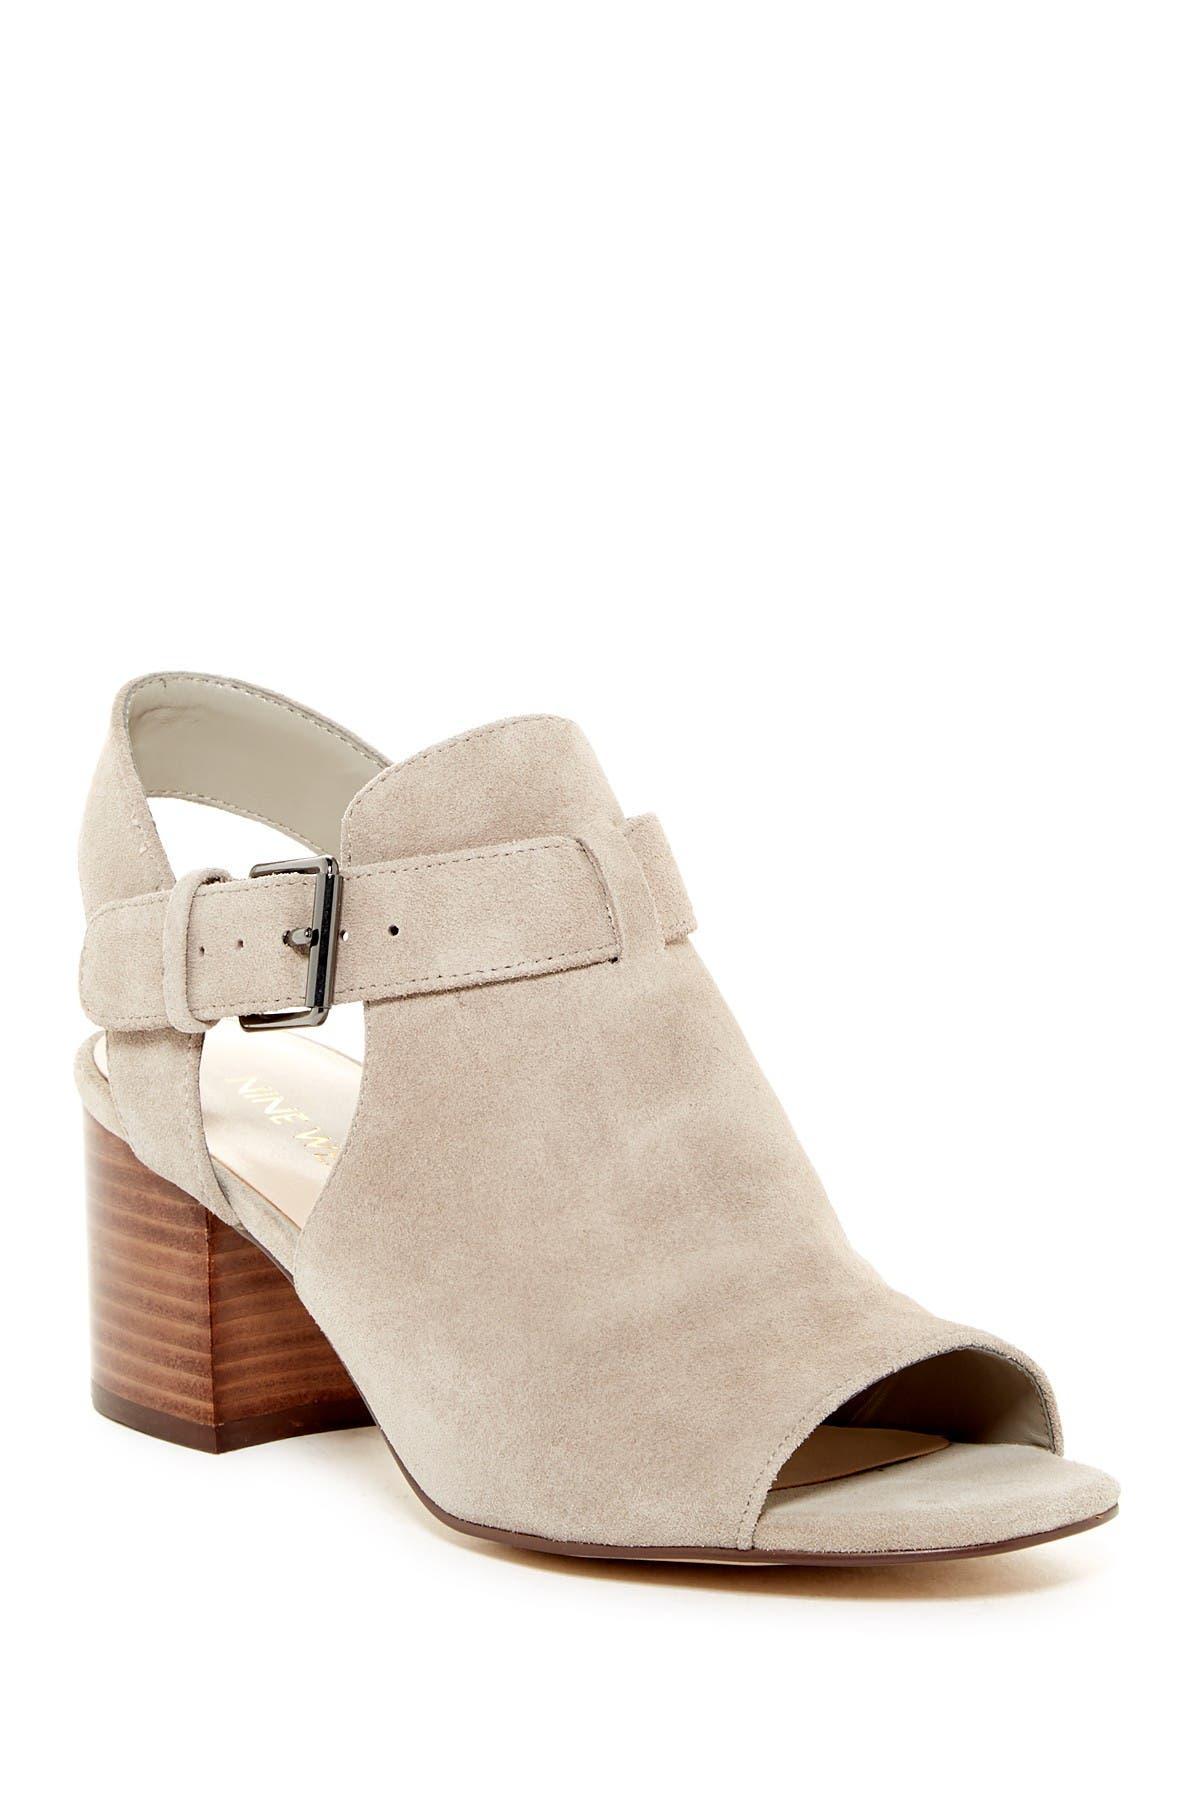 Image of Nine West Ganci Sandal - Wide Width Available